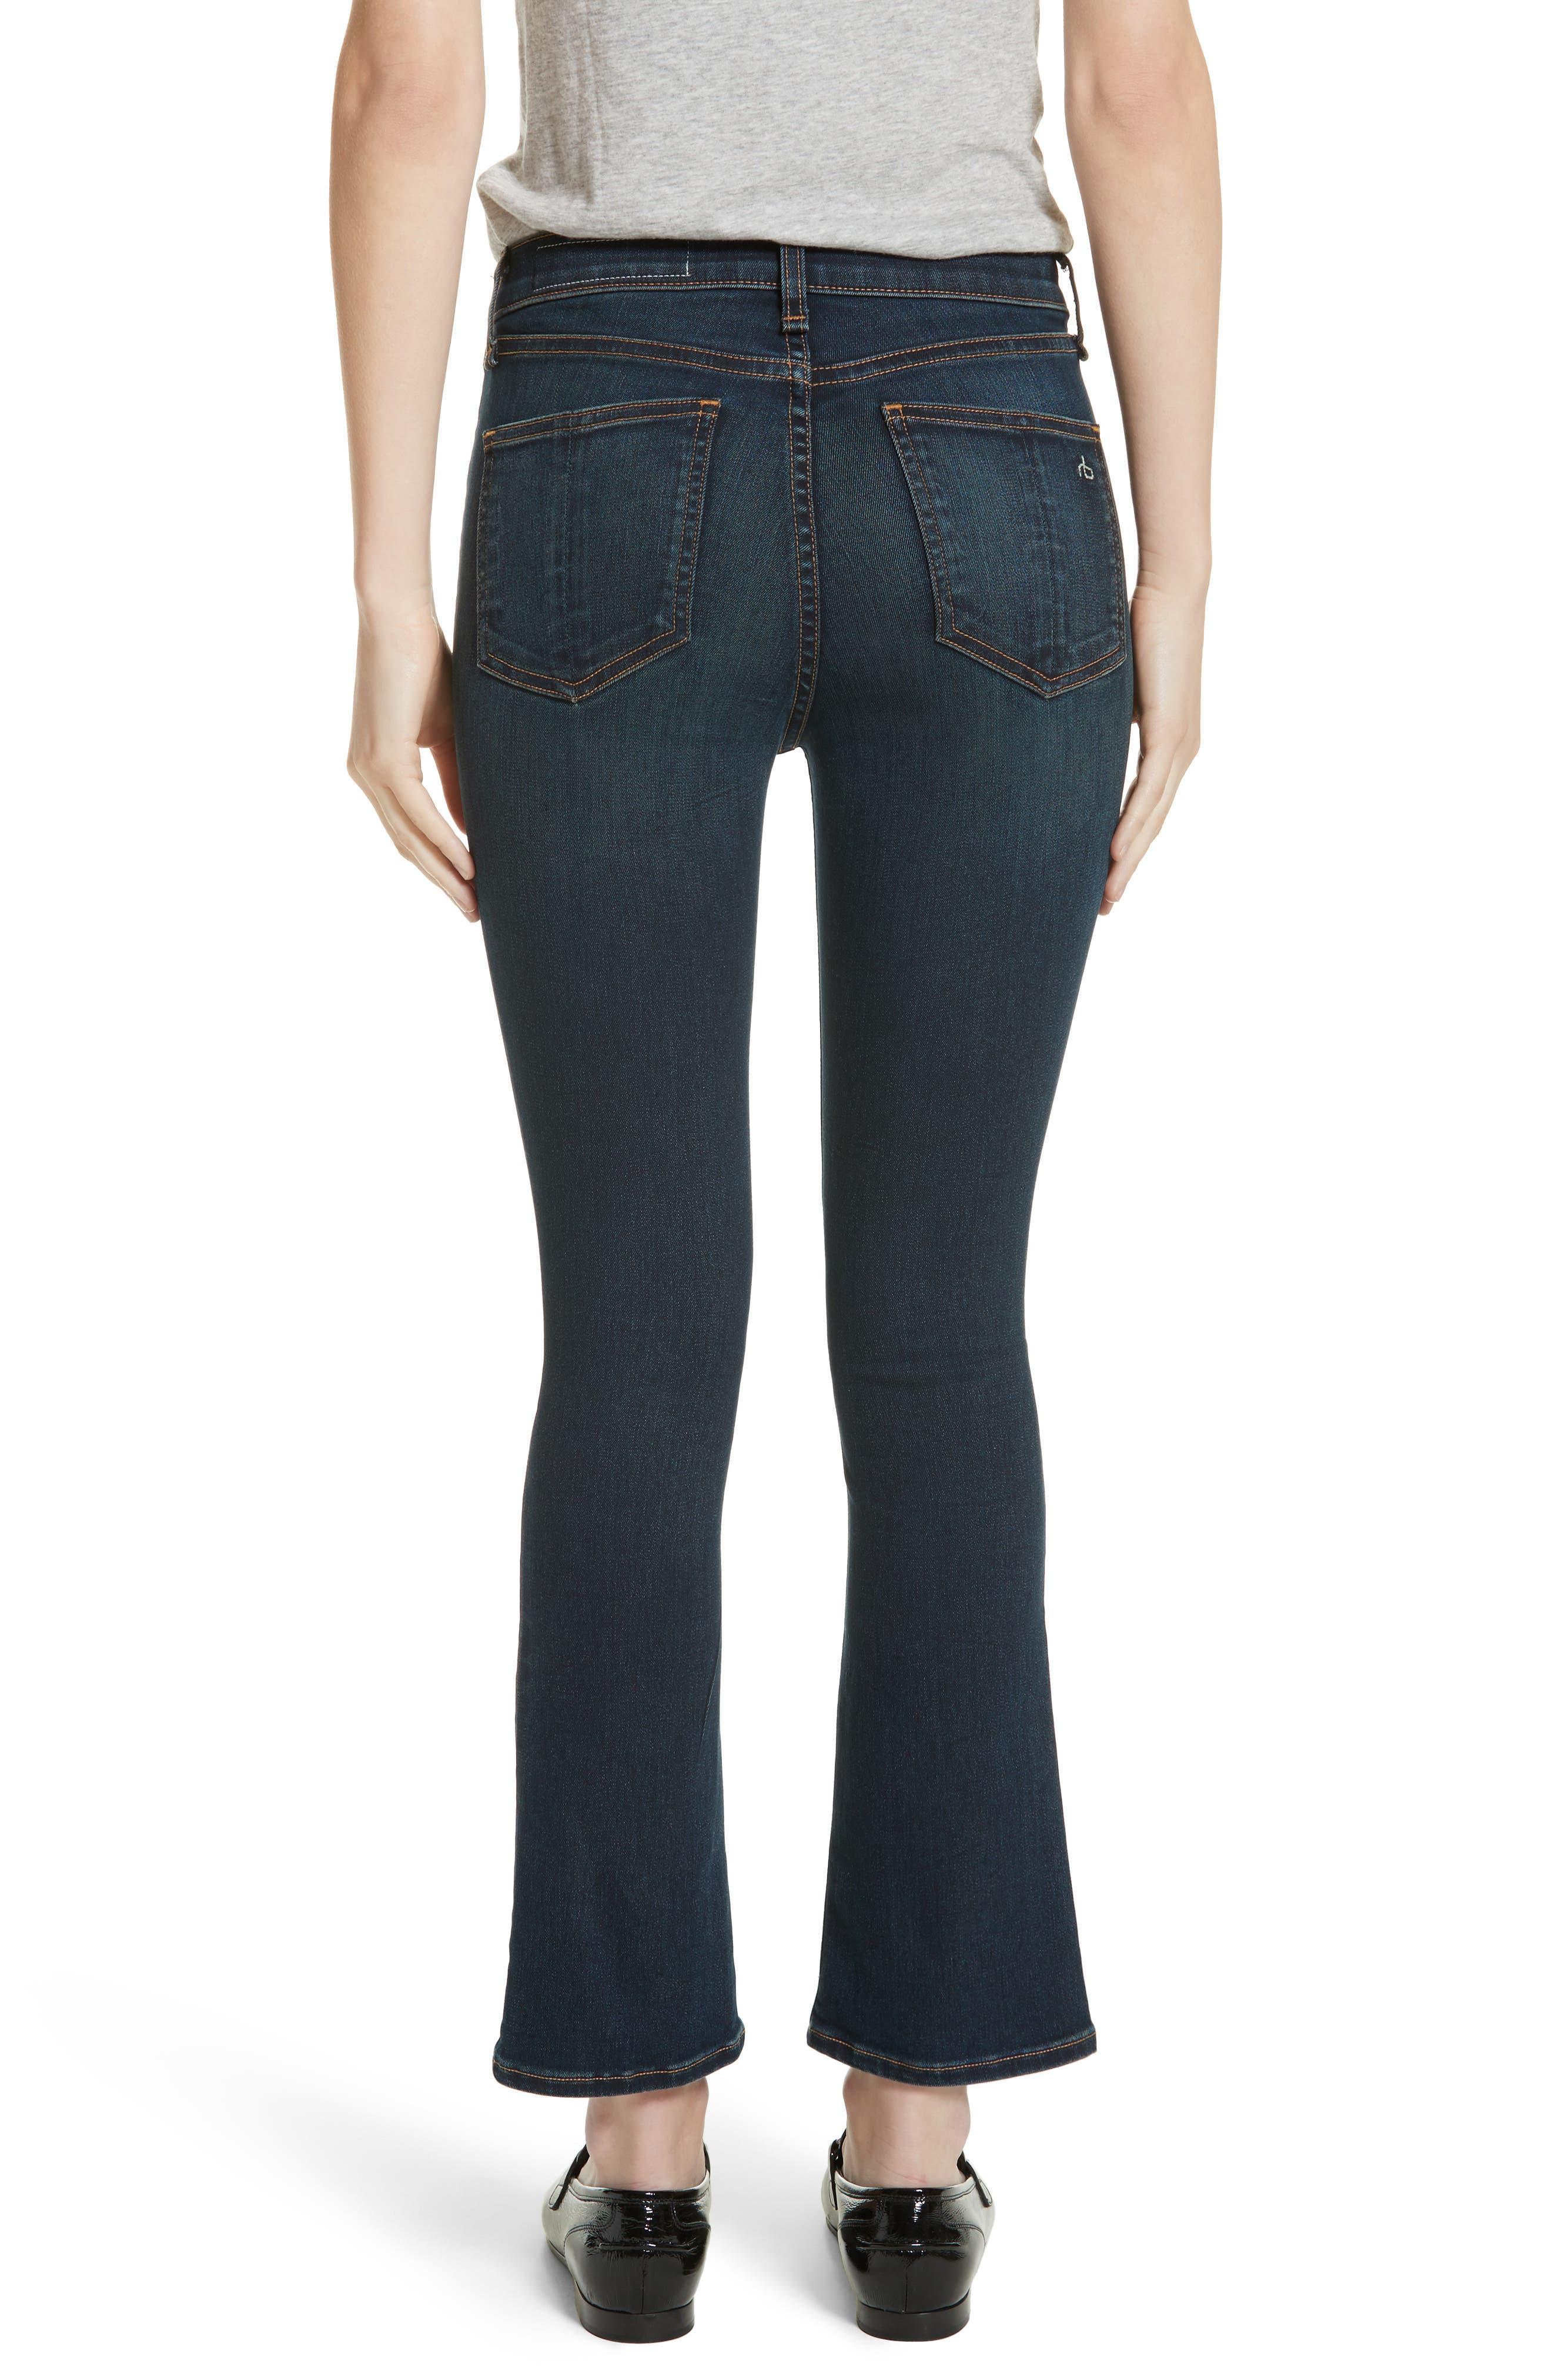 Hana High Waist Crop Flare Jeans,                             Alternate thumbnail 2, color,                             421